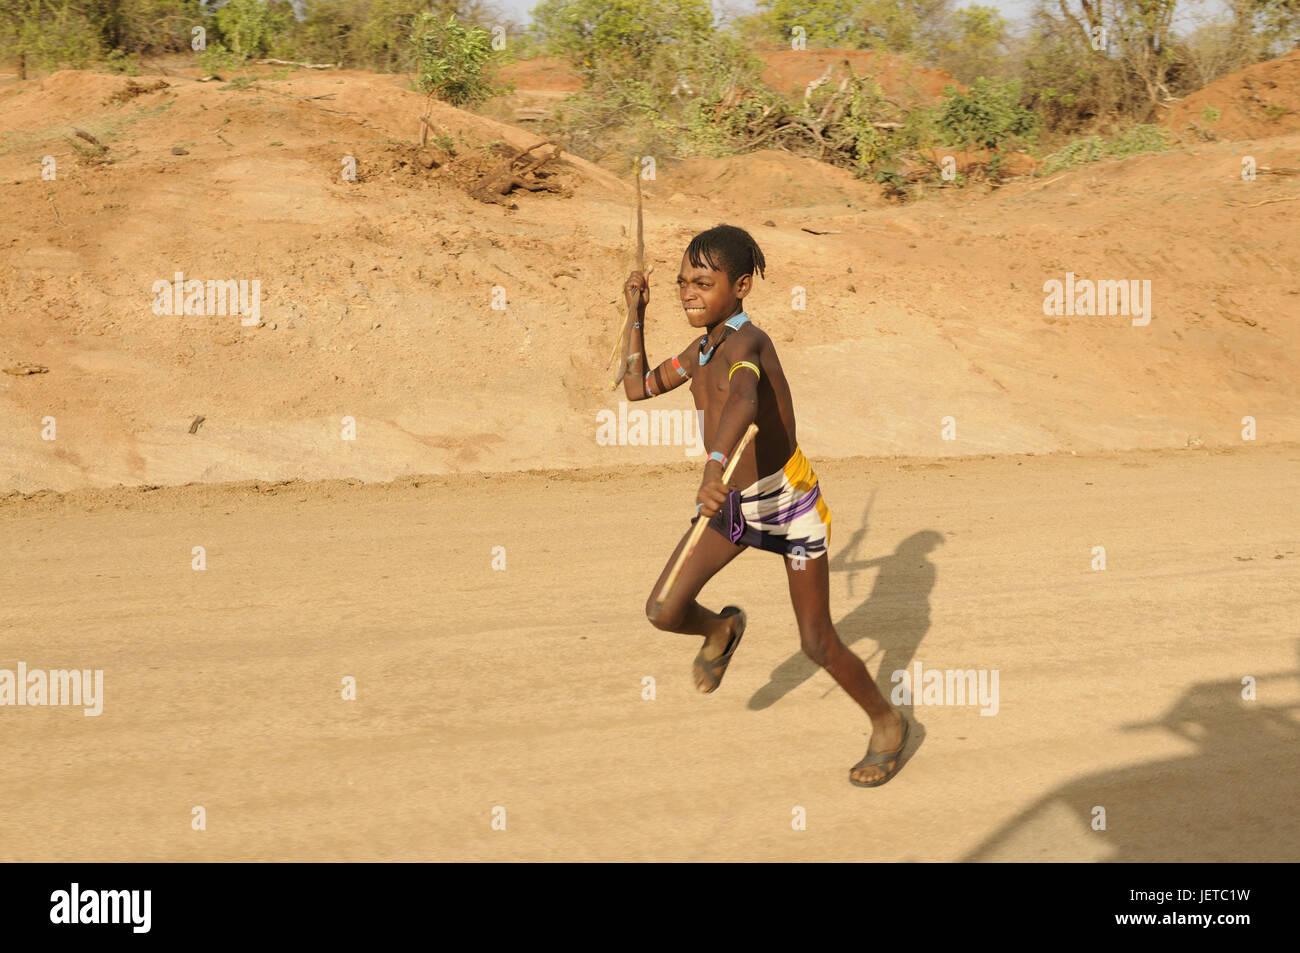 Boy, tribe Ari, spear, street, run, southern Omotal, south Ethiopia, - Stock Image